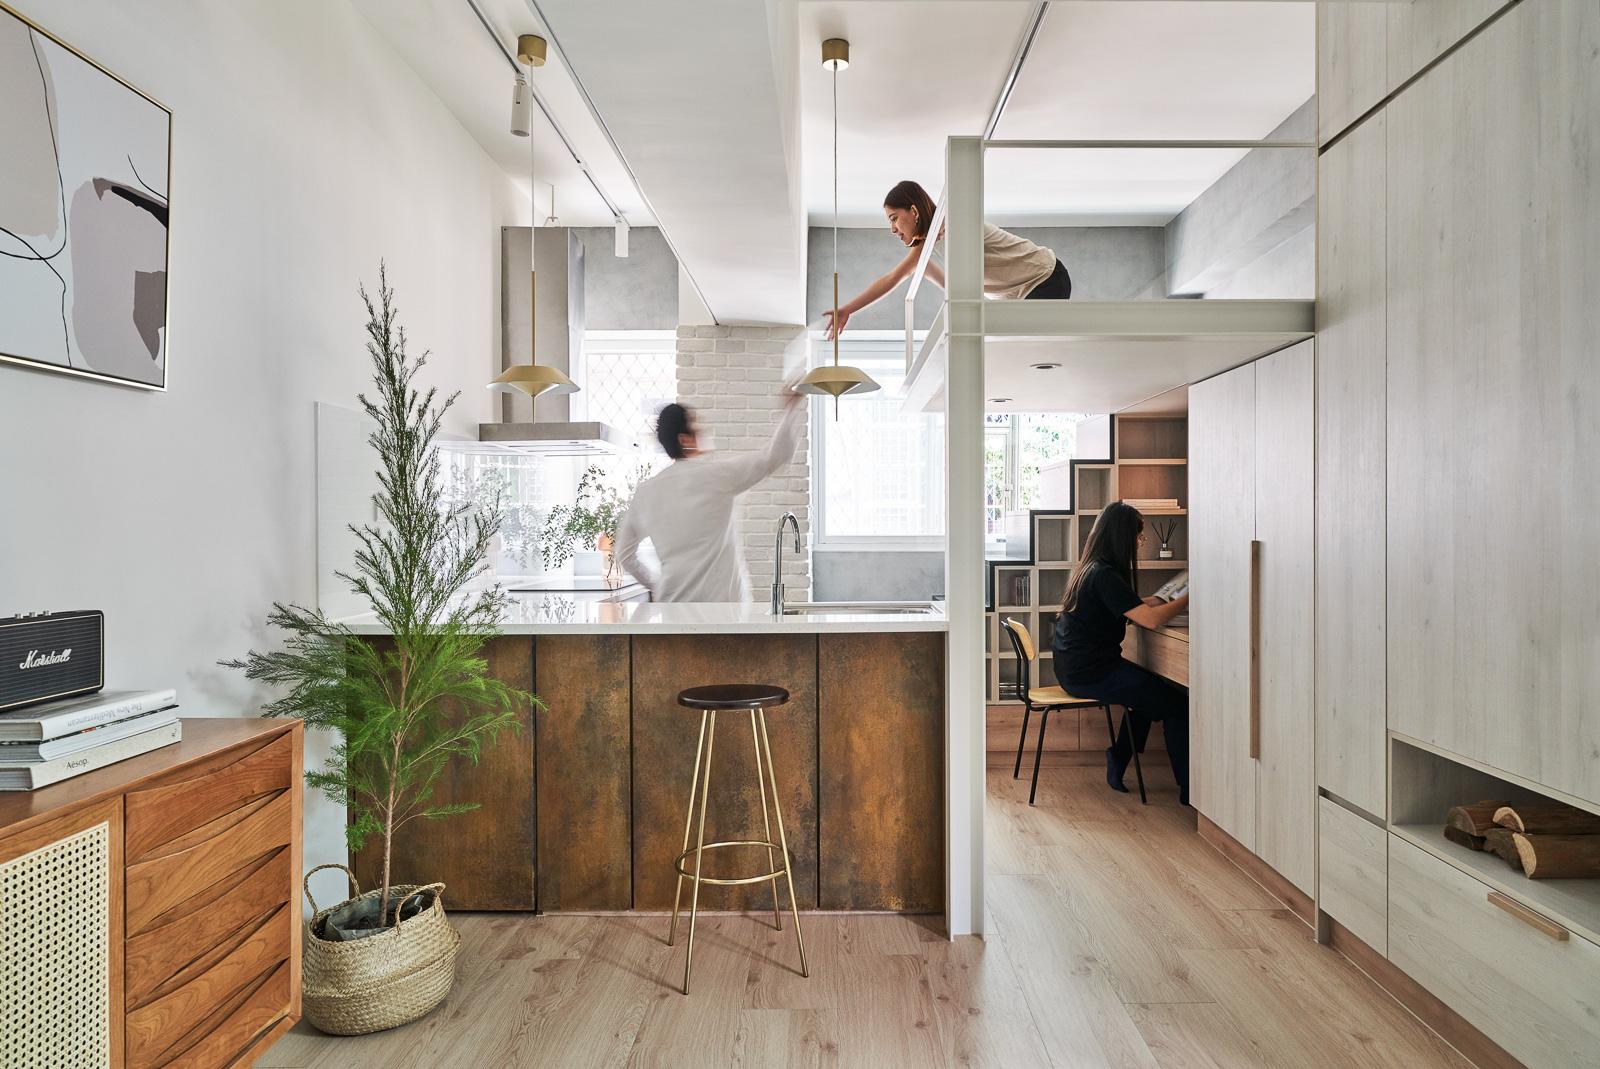 NestSpace_SmallHouse_S-167